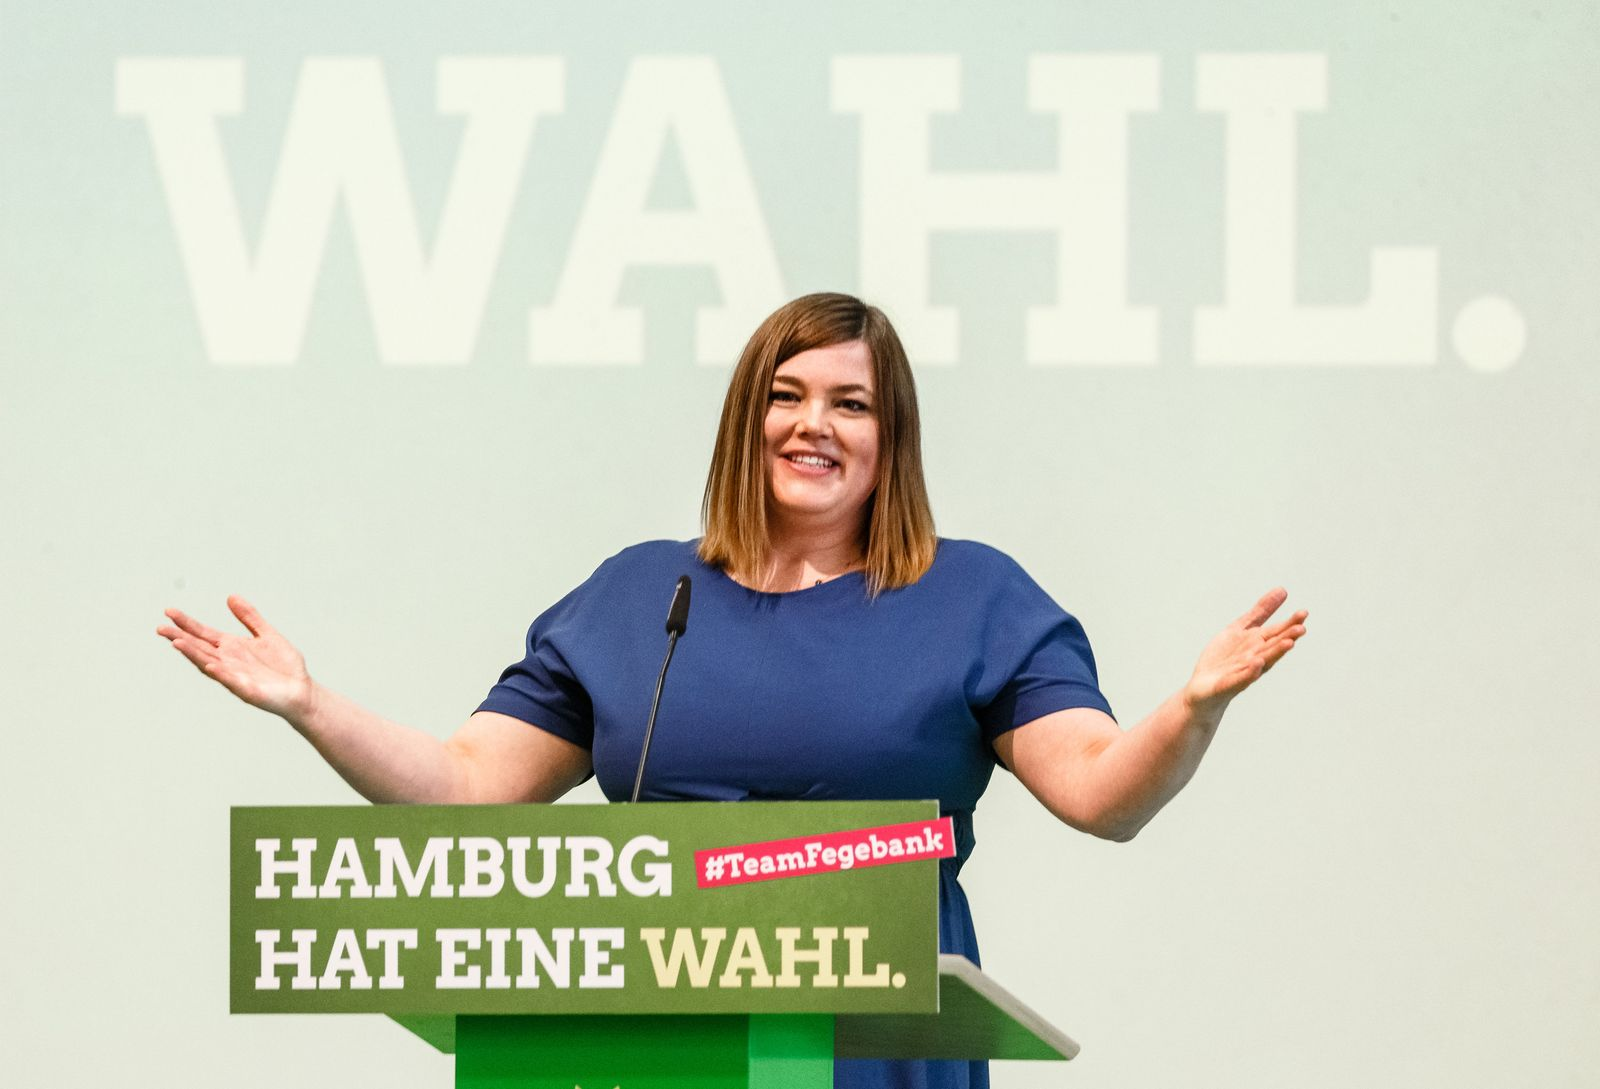 Bürgermeisterkandidatin Katharina Fegebank